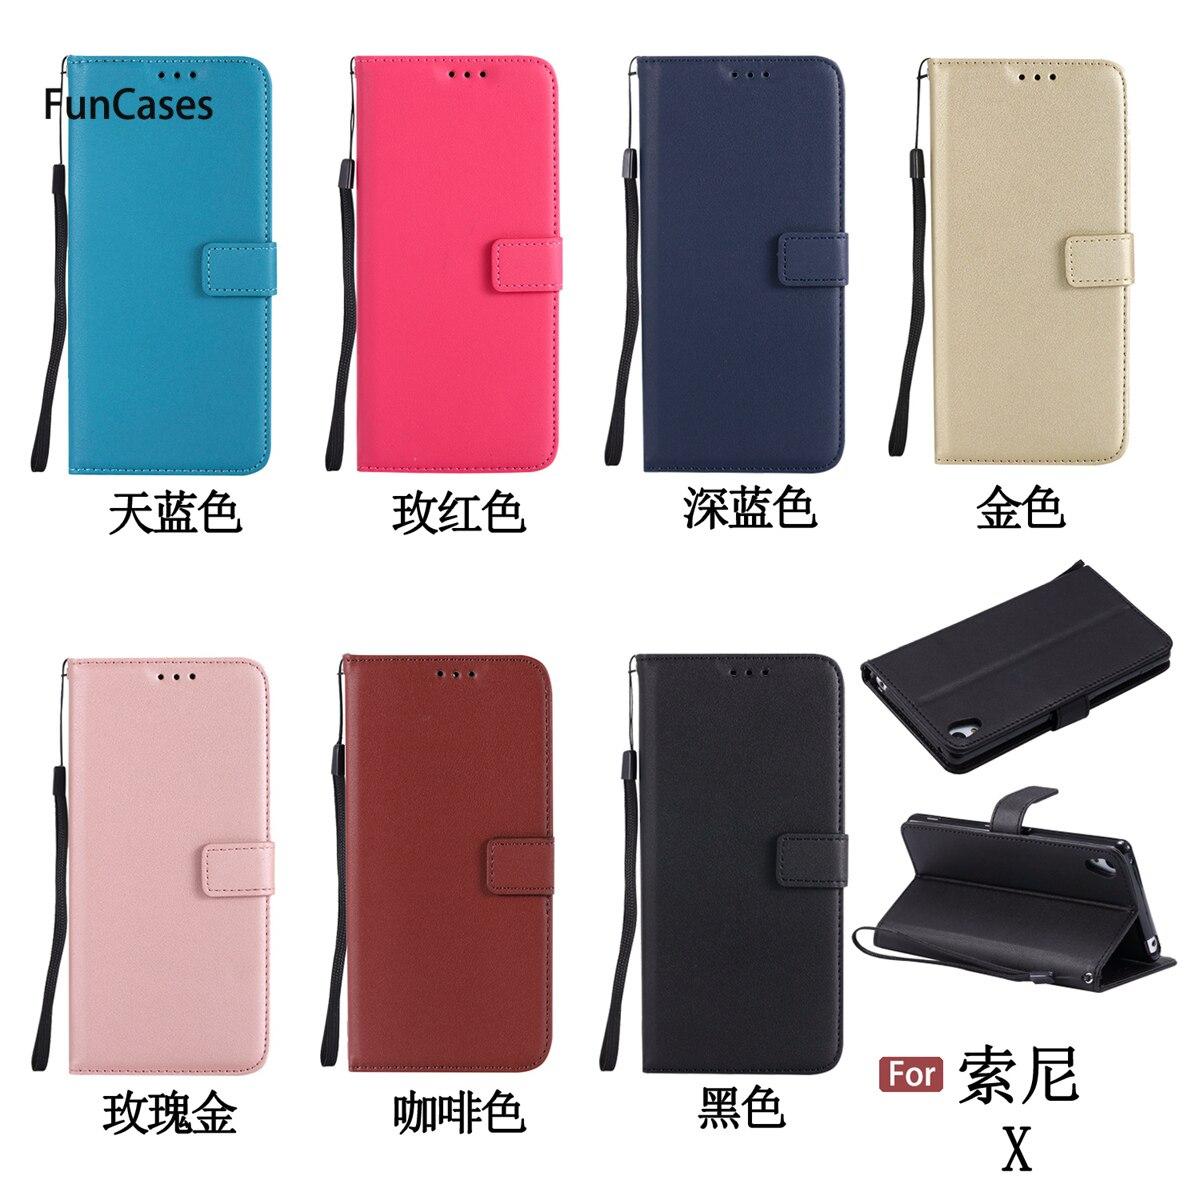 Multicolor PU Leather Case sFor Aksesuar Sony E5 Soft Silicone <font><b>Phone</b></font> Case Back Sports Silicone Cover For Sony <font><b>Xperia</b></font> E5 Kilifi